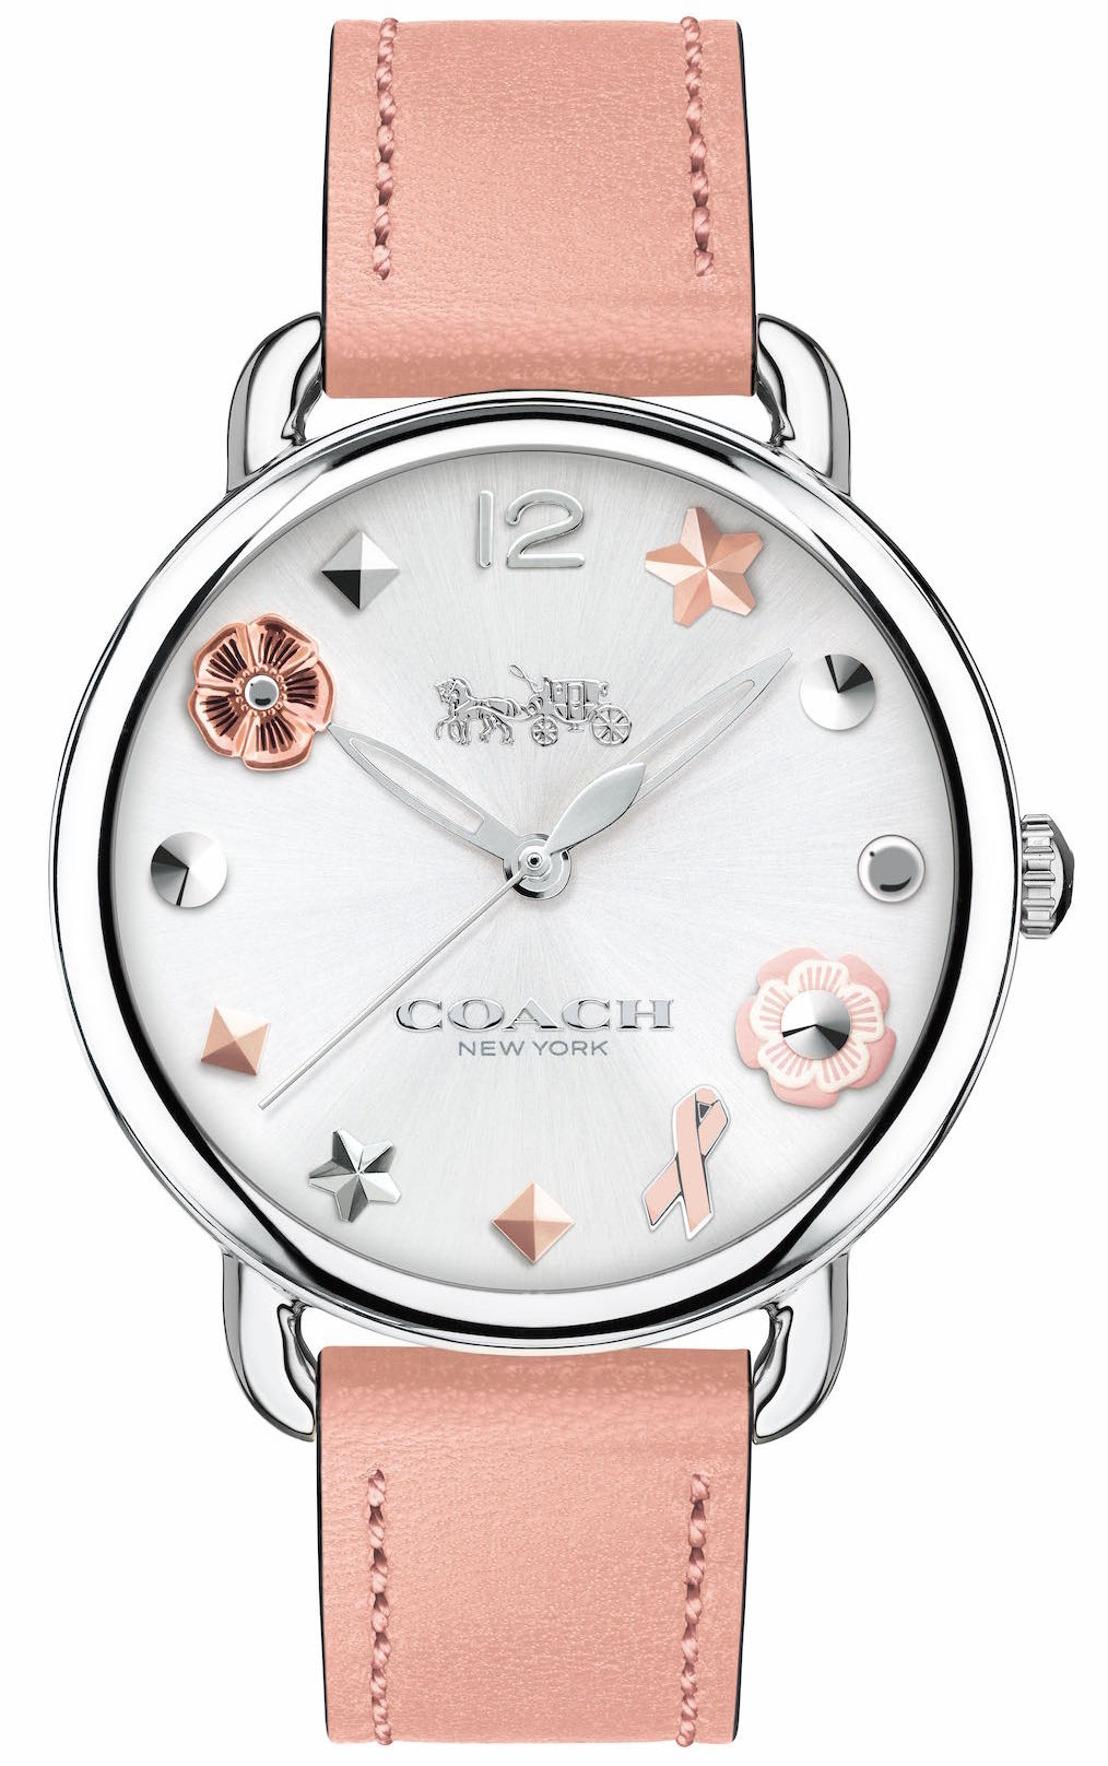 Delancey by Coach, un reloj con causa